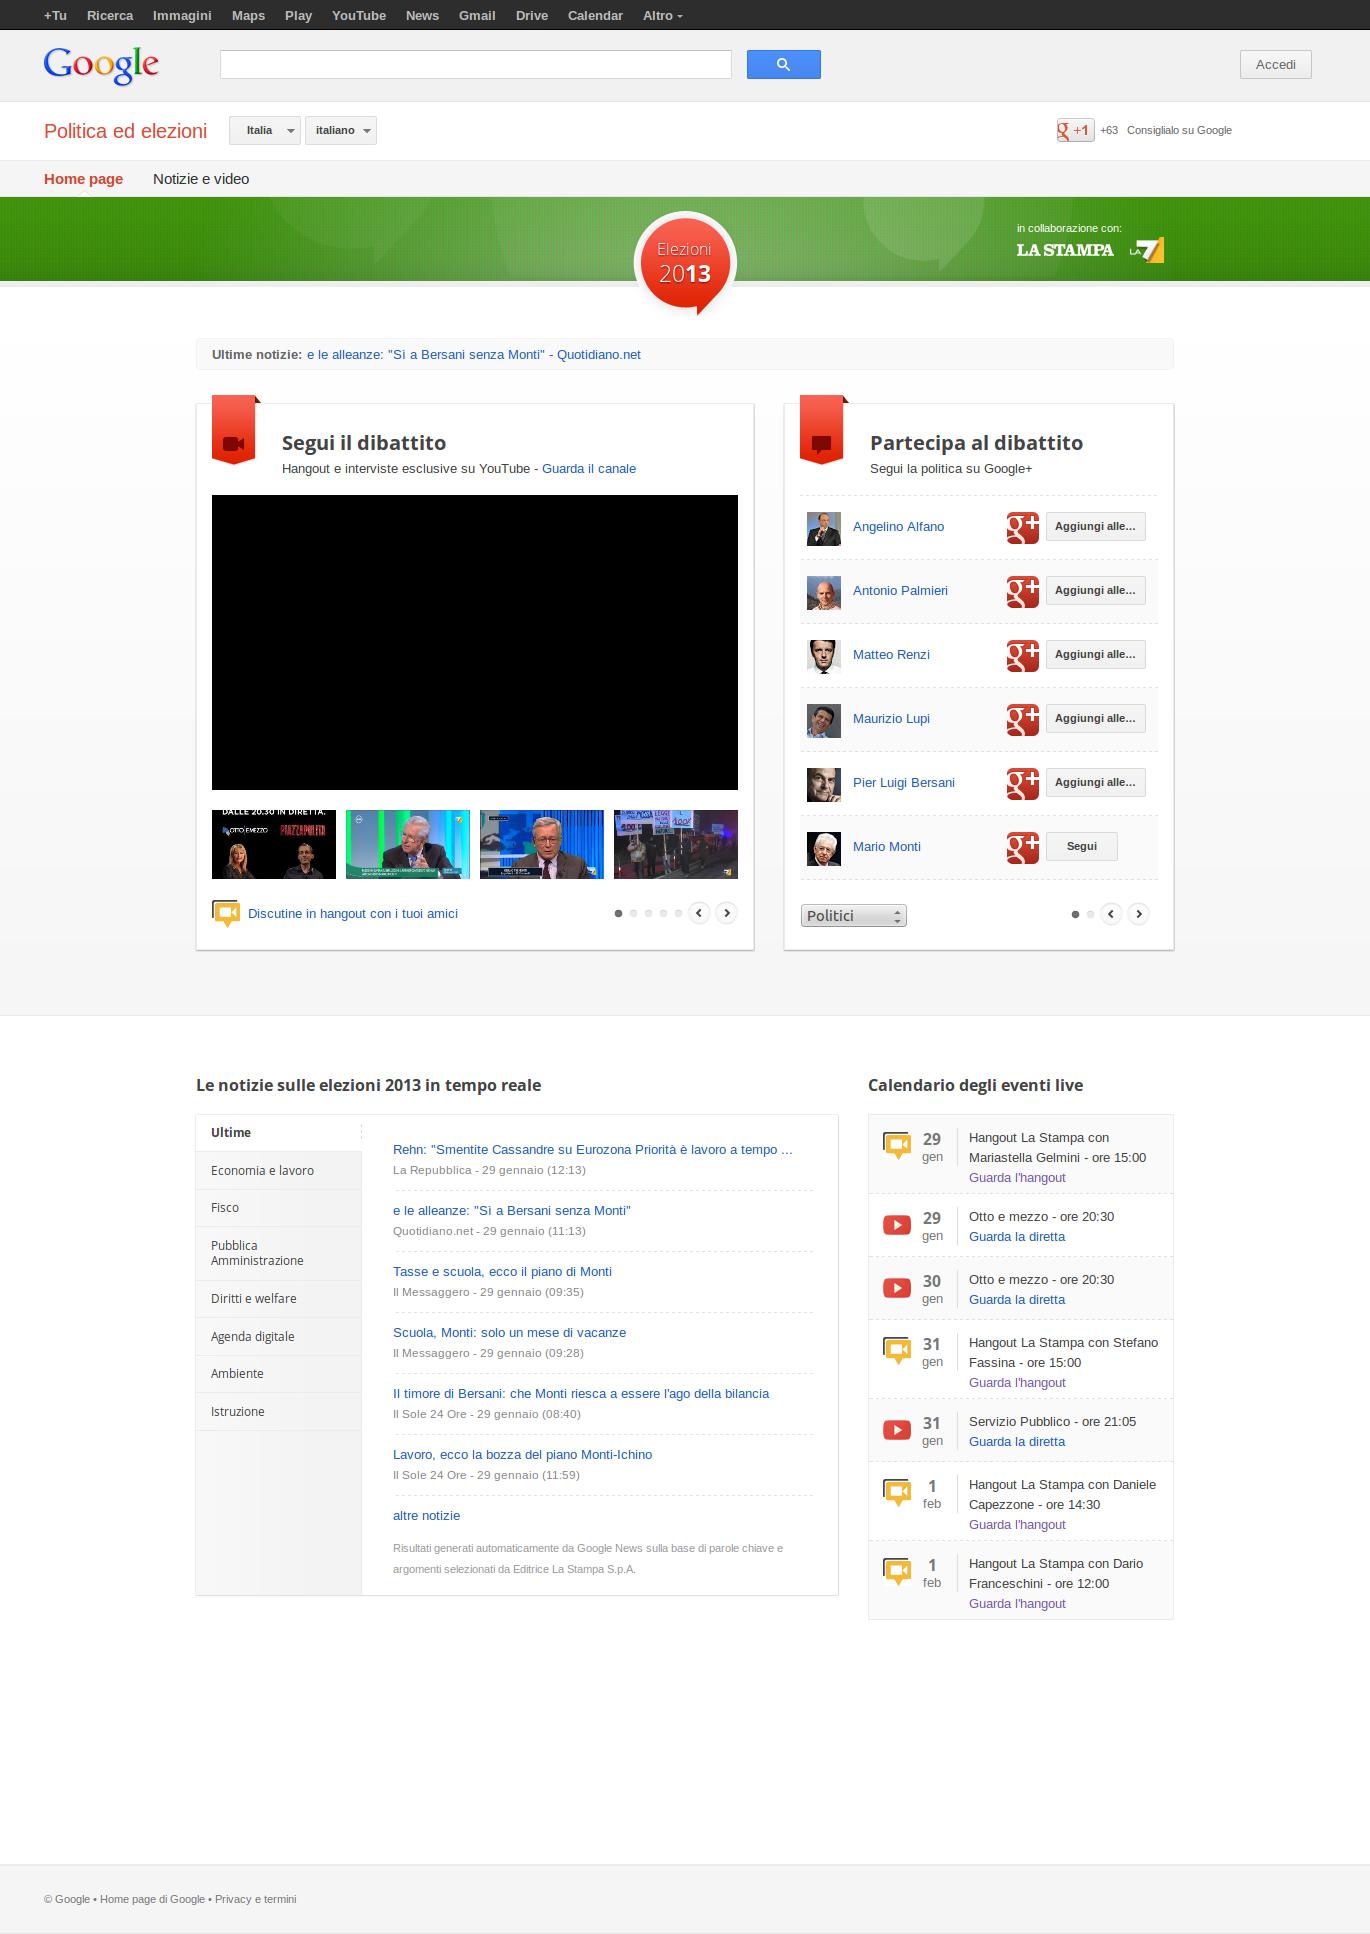 Screenshot Google Elezioni edizione Italiana